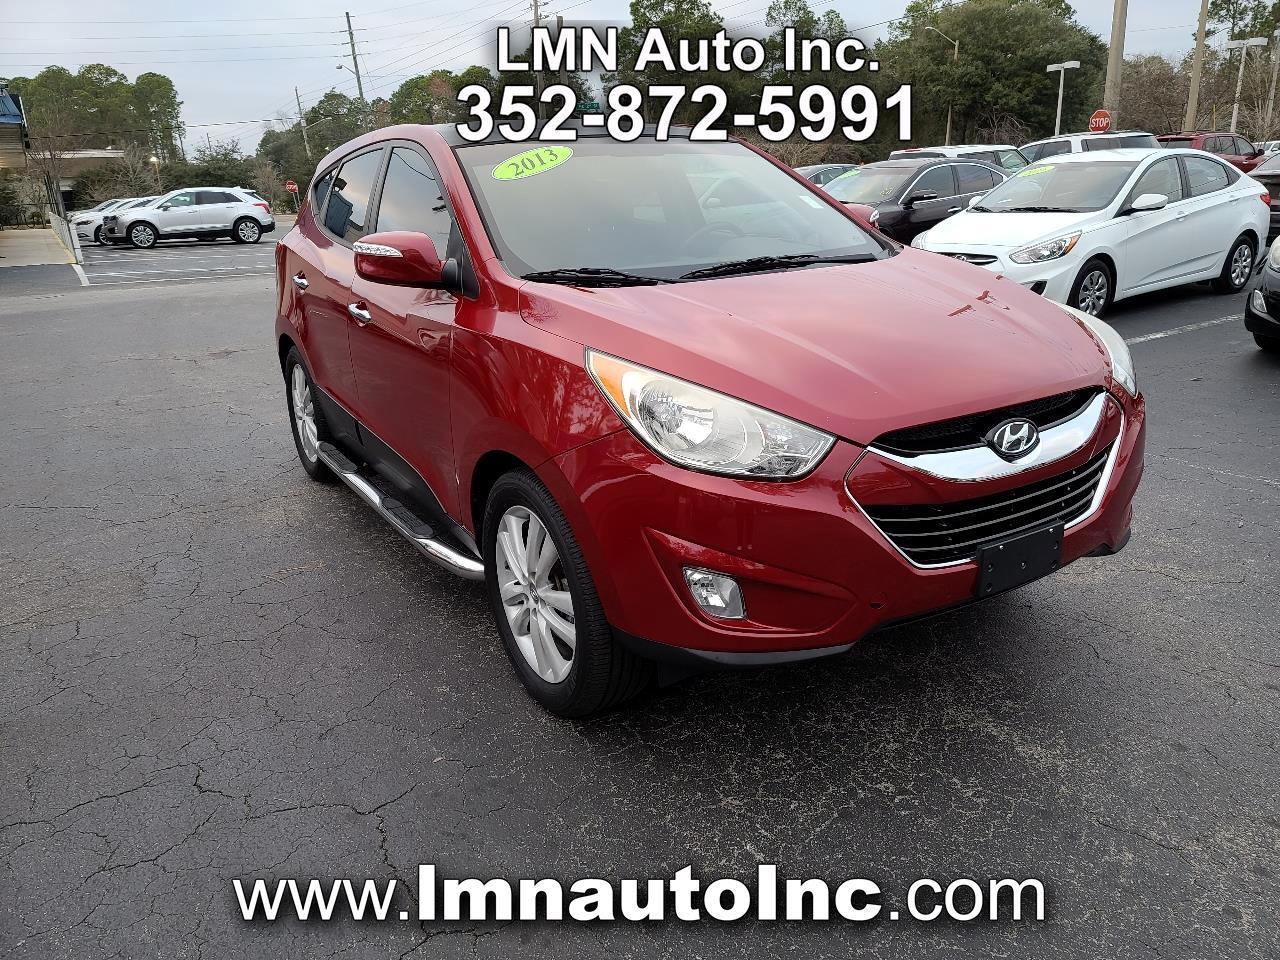 Hyundai Tucson FWD 4dr Auto Limited 2013